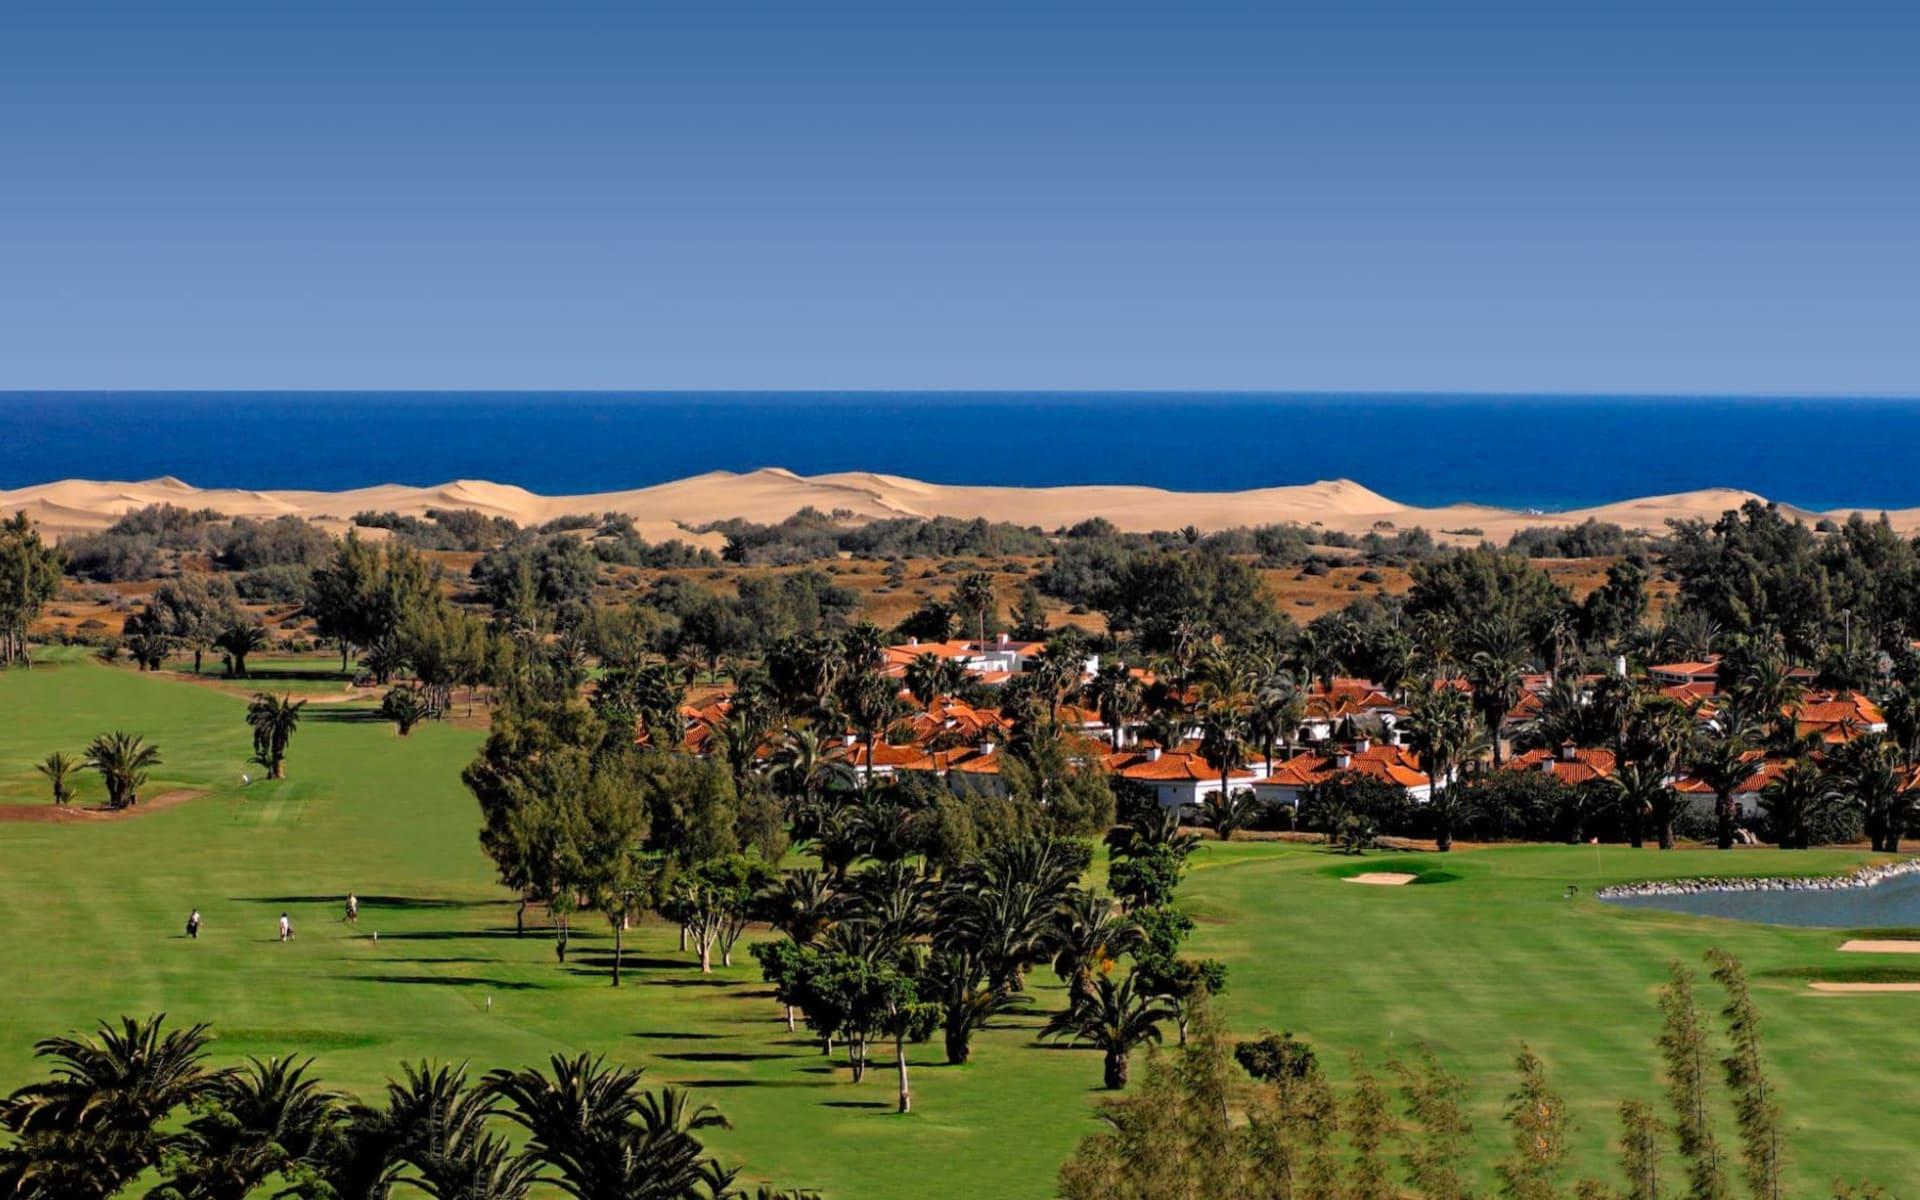 Maspalomas - Eo Maspalomas Aparthotel ab Gran Canaria: maspalomas golf